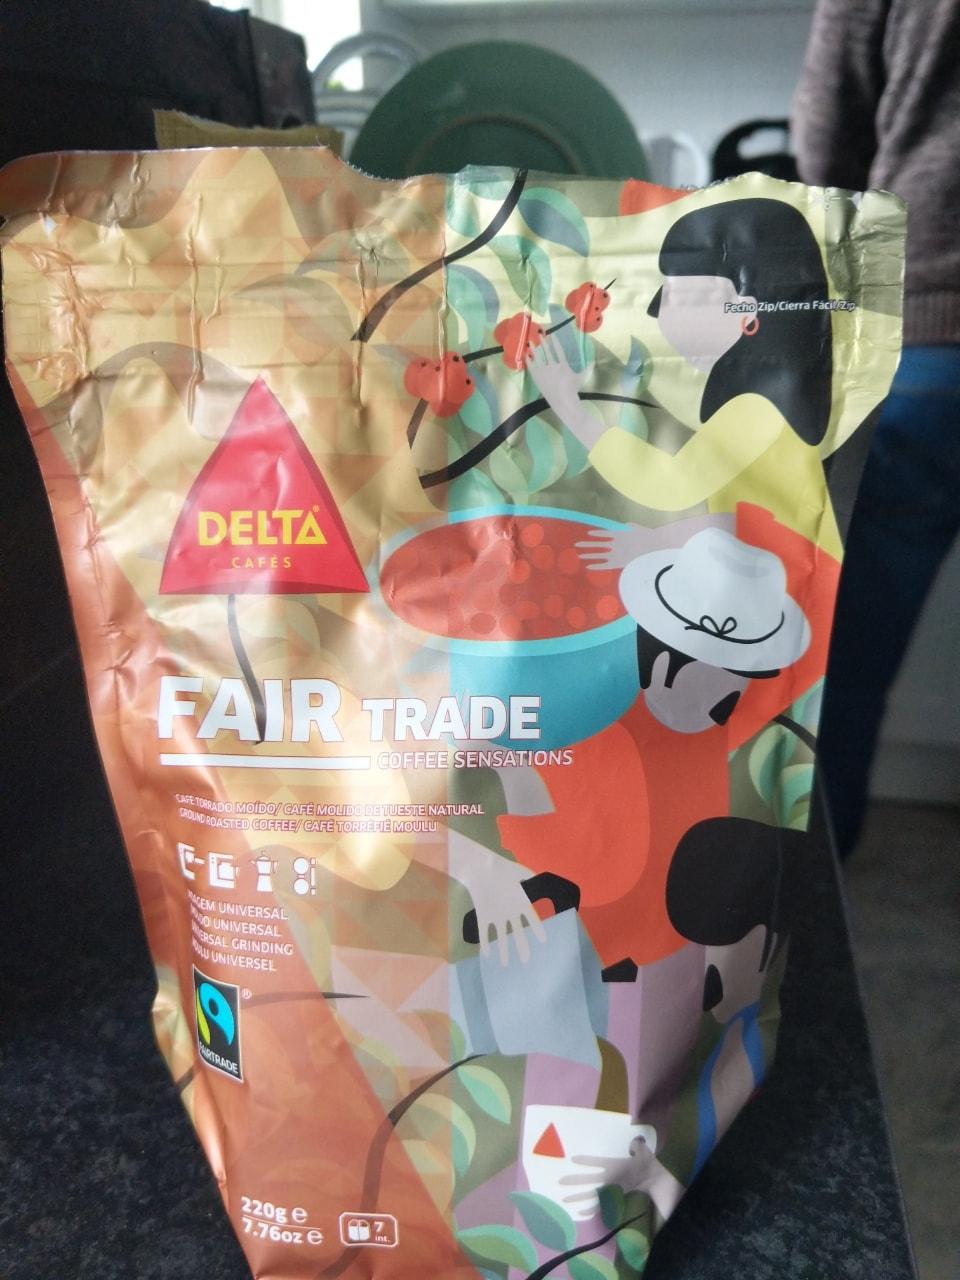 Portuguese fair trade coffee (universal grinding)